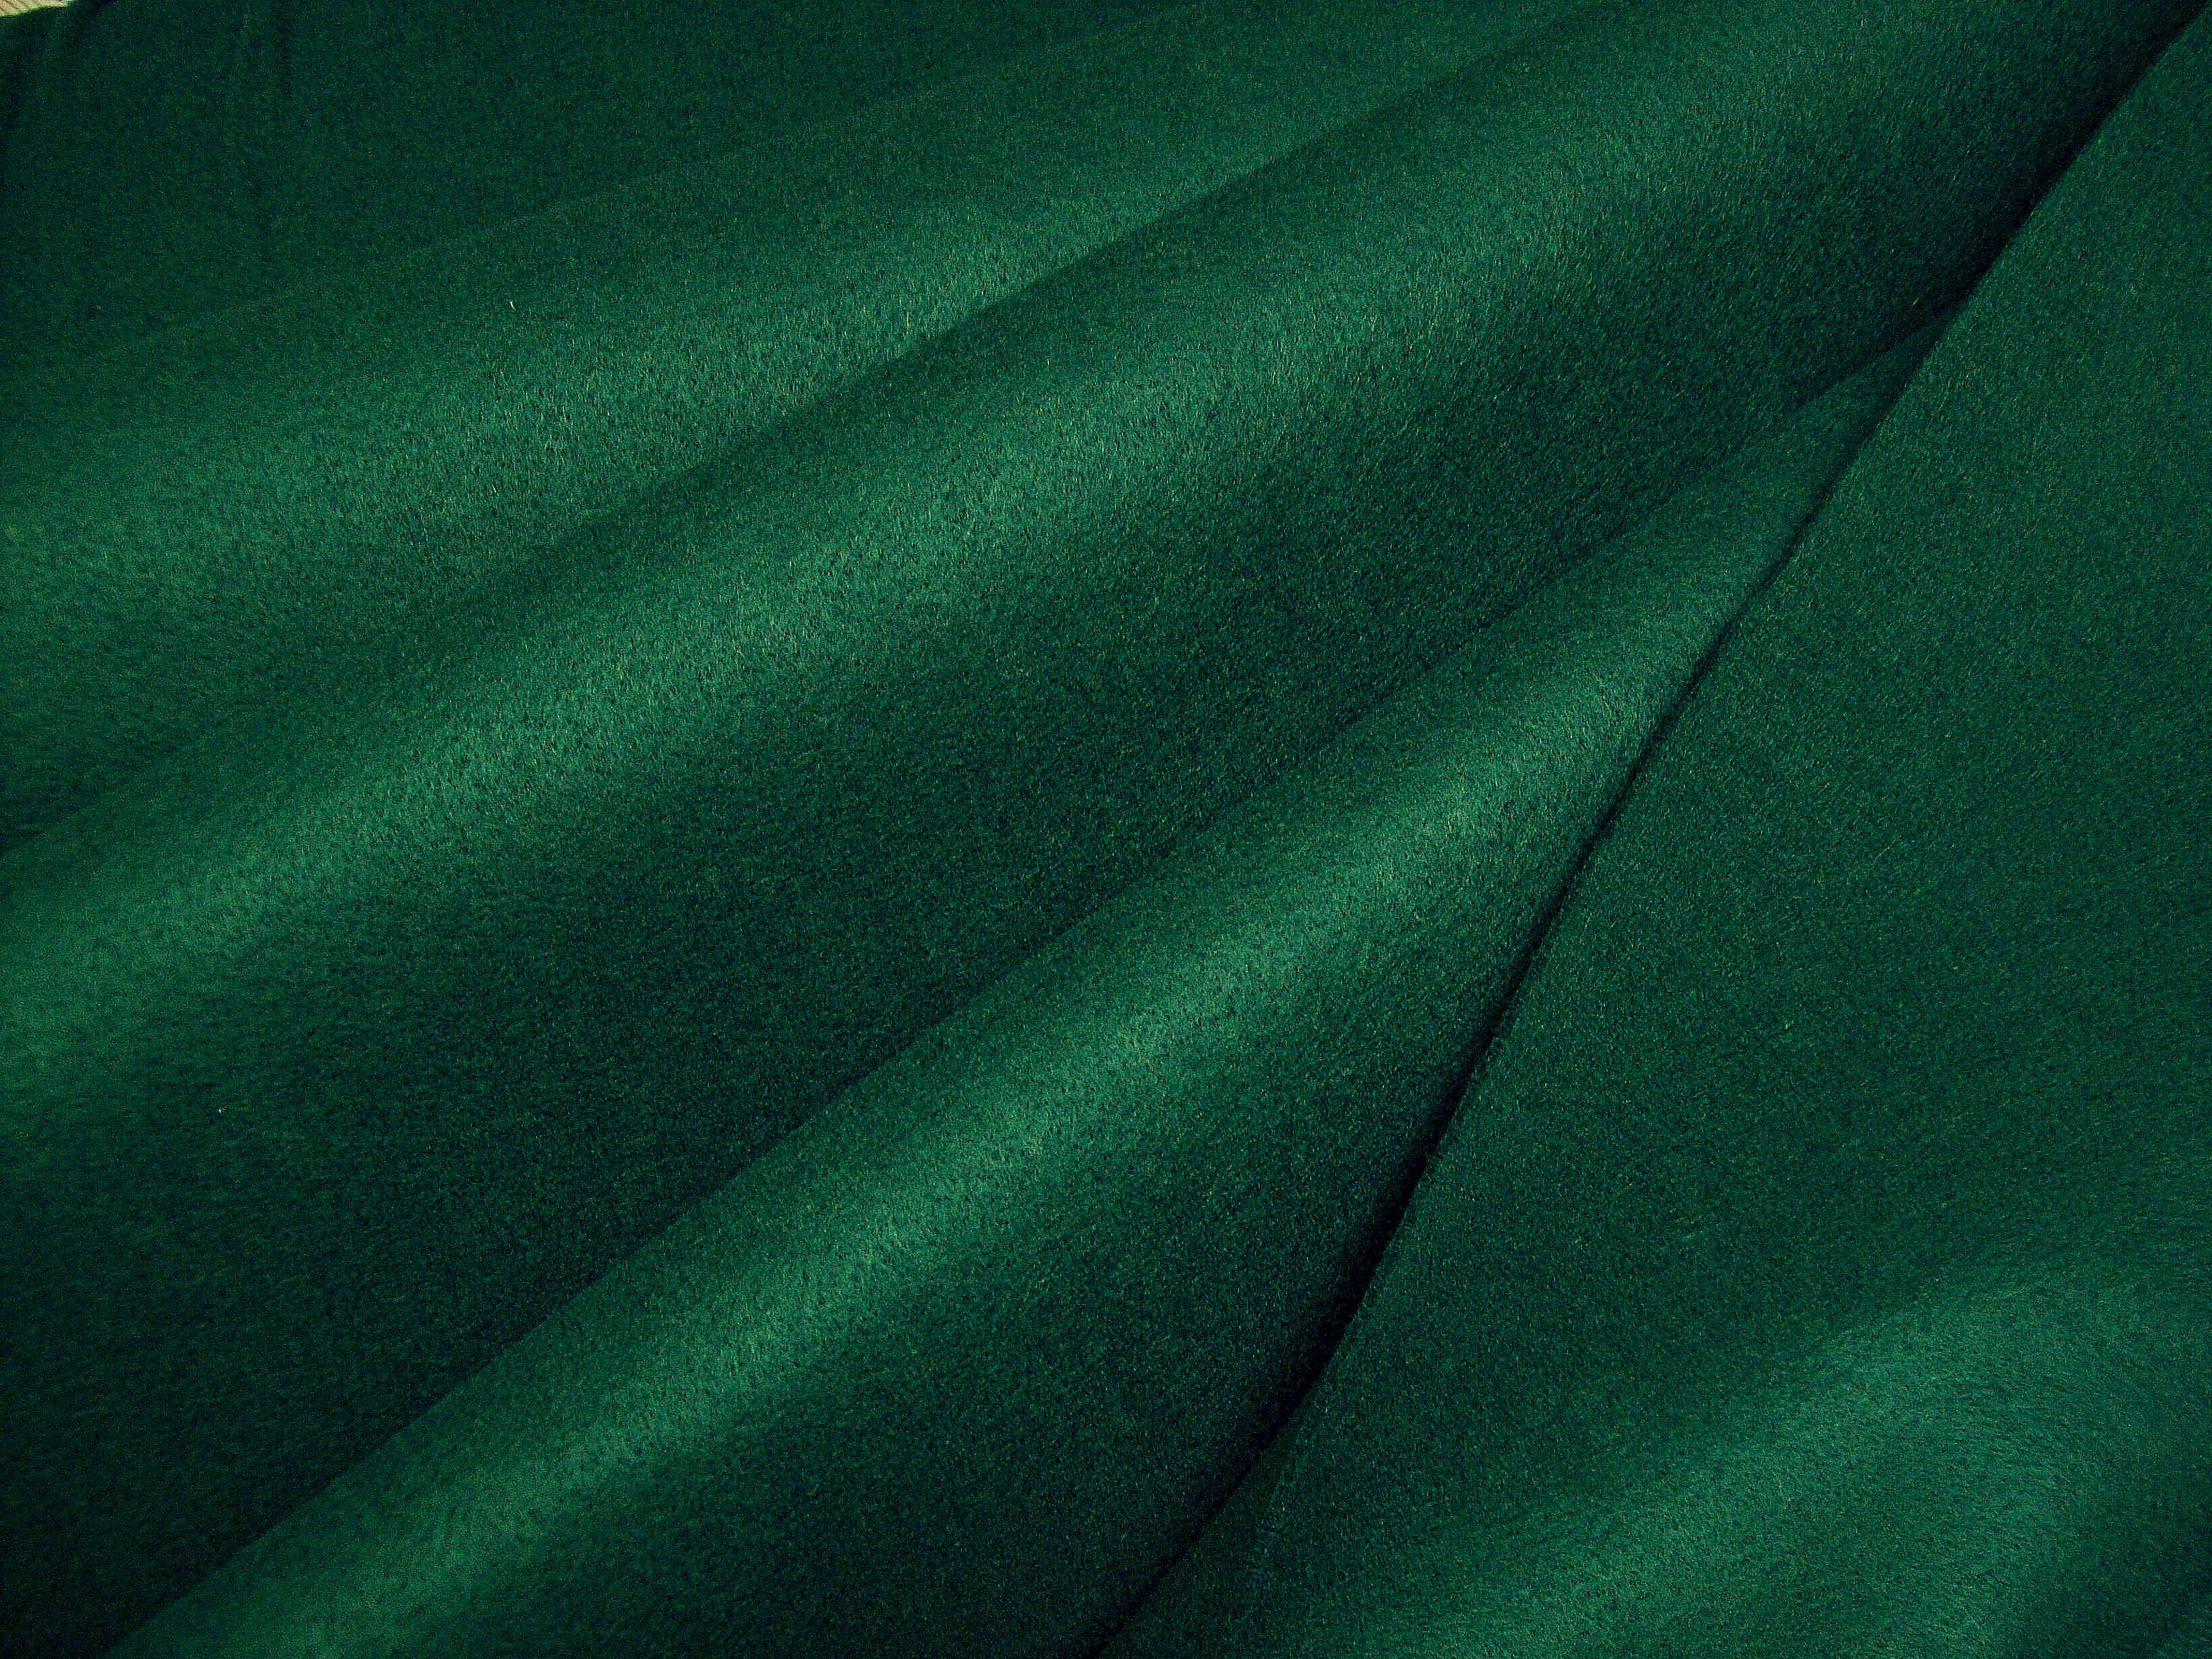 stoffboerse berlin stoff stoffe als meterware und. Black Bedroom Furniture Sets. Home Design Ideas